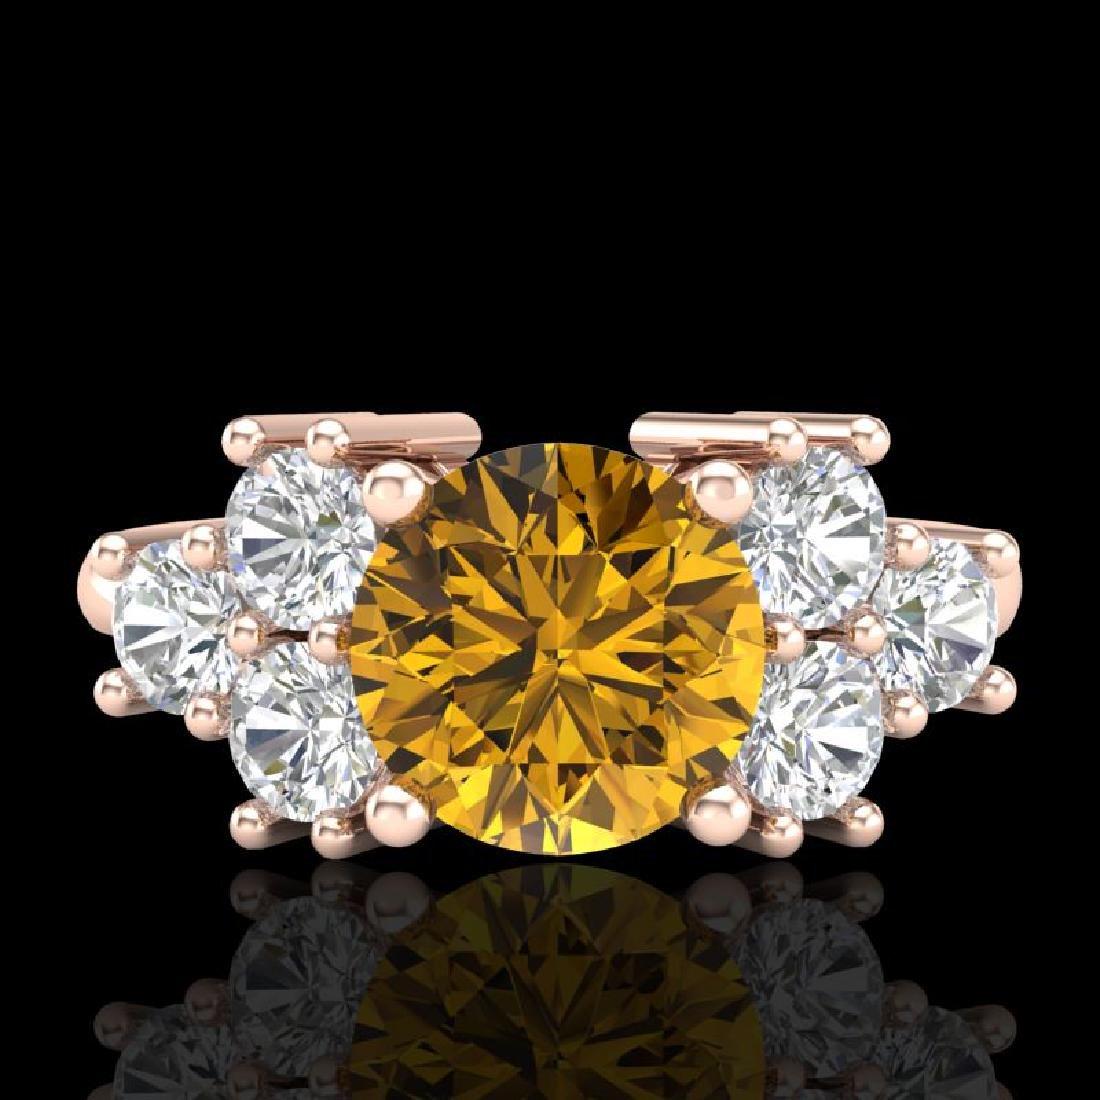 2.1 CTW Intense Fancy Yellow Diamond Solitaire Classic - 2